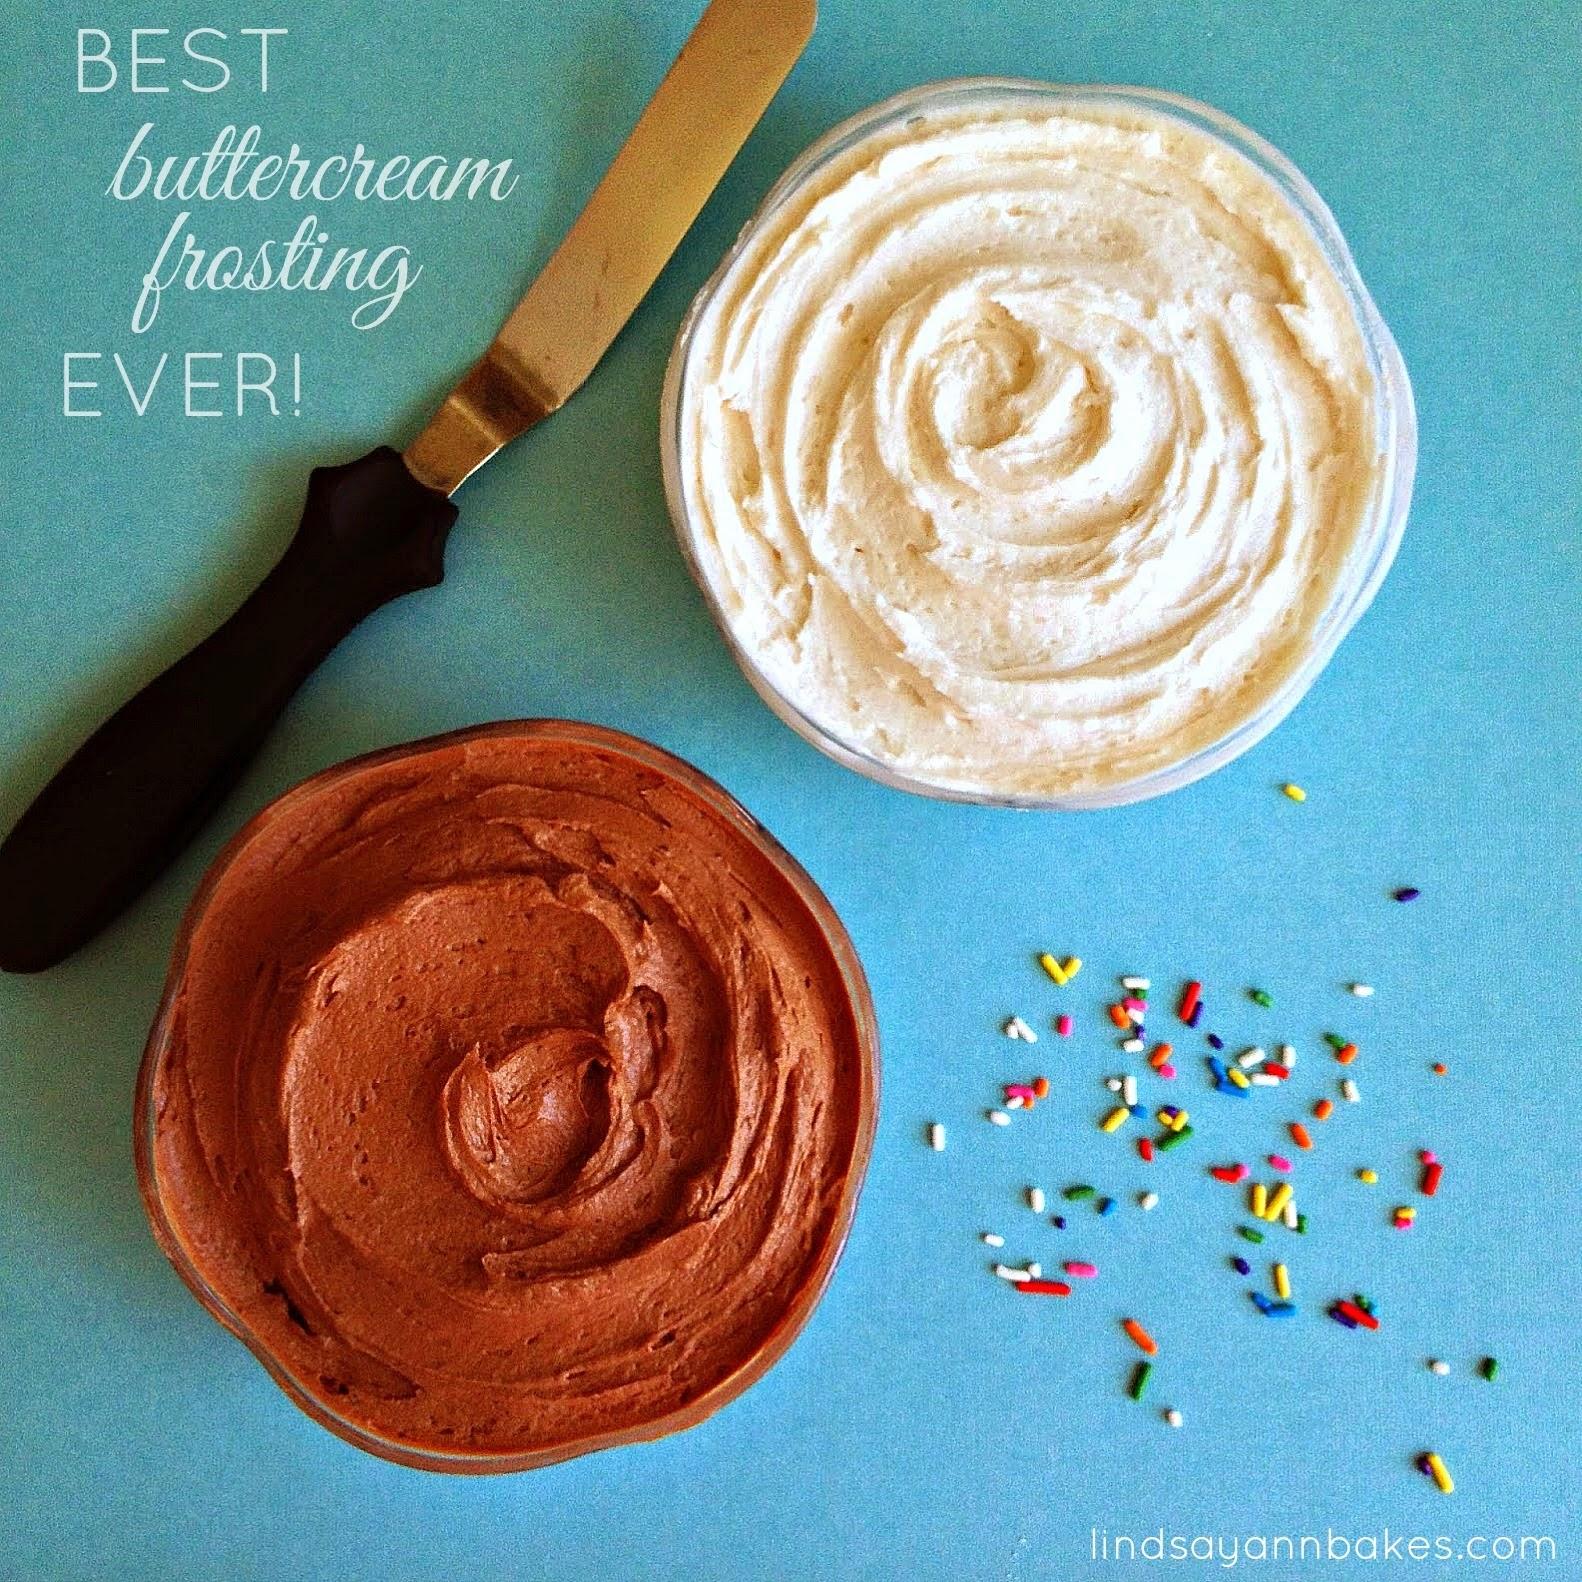 {VIDEO} Buttercream Frosting Recipe (in Over 2 Dozen